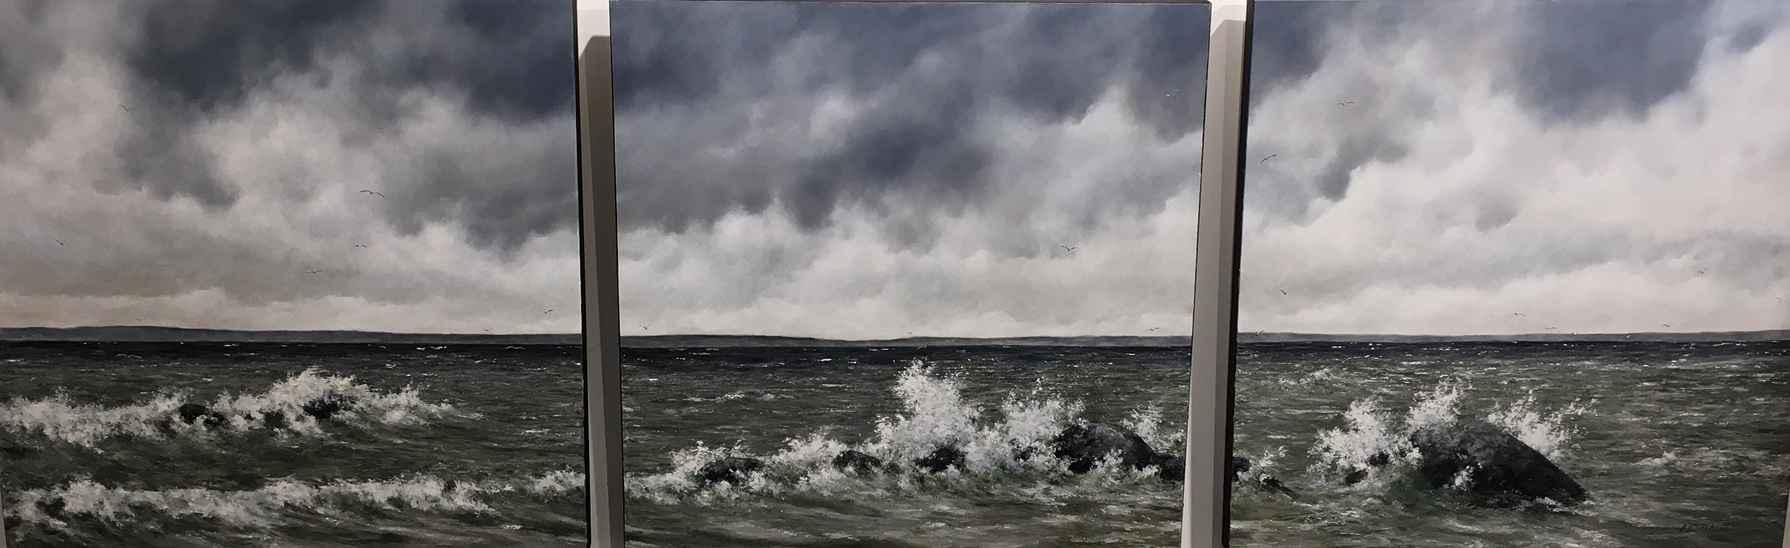 Chain Reaction (Tript... by Mr. Lorne McDermott - Masterpiece Online